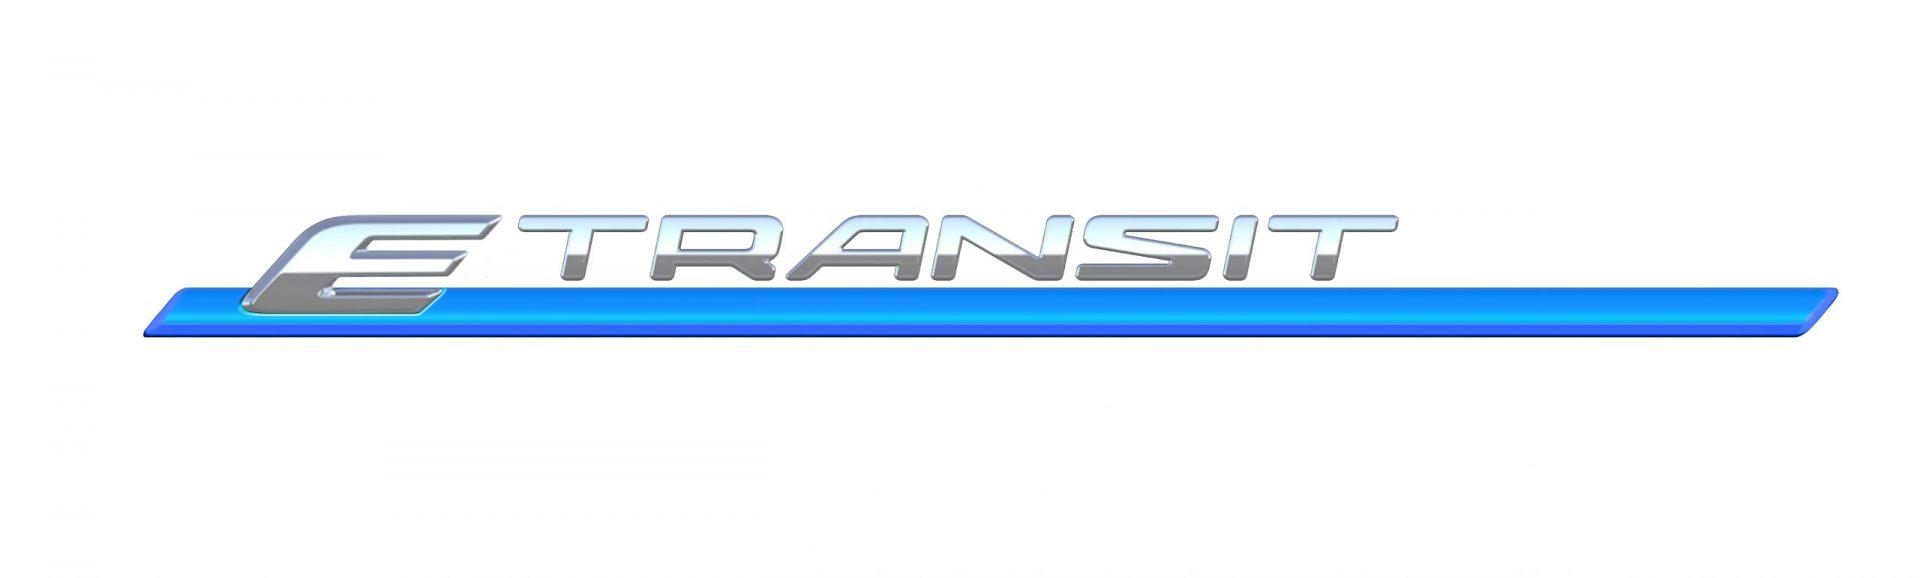 Ford Prepares To Unveil E Transit On Nov. 12